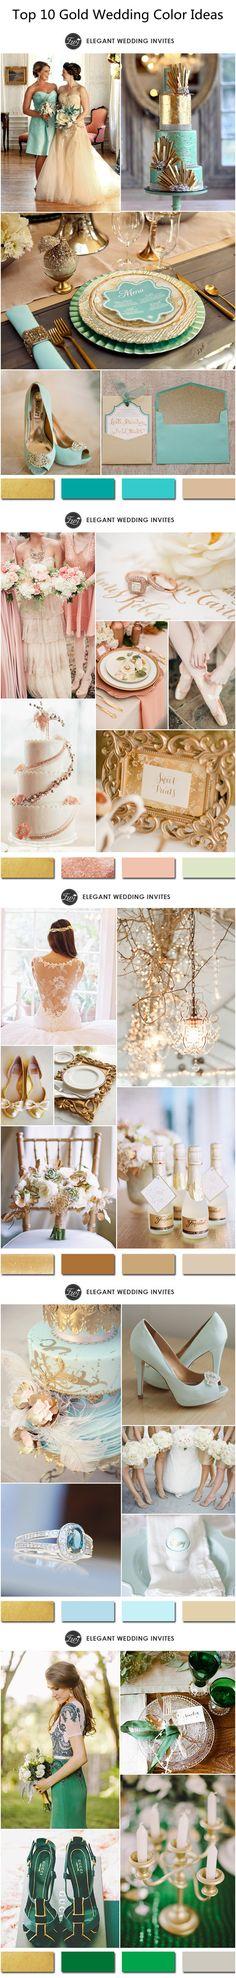 Top 10 Gold Wedding Color Ideas 2015 Trends #weddingcolors